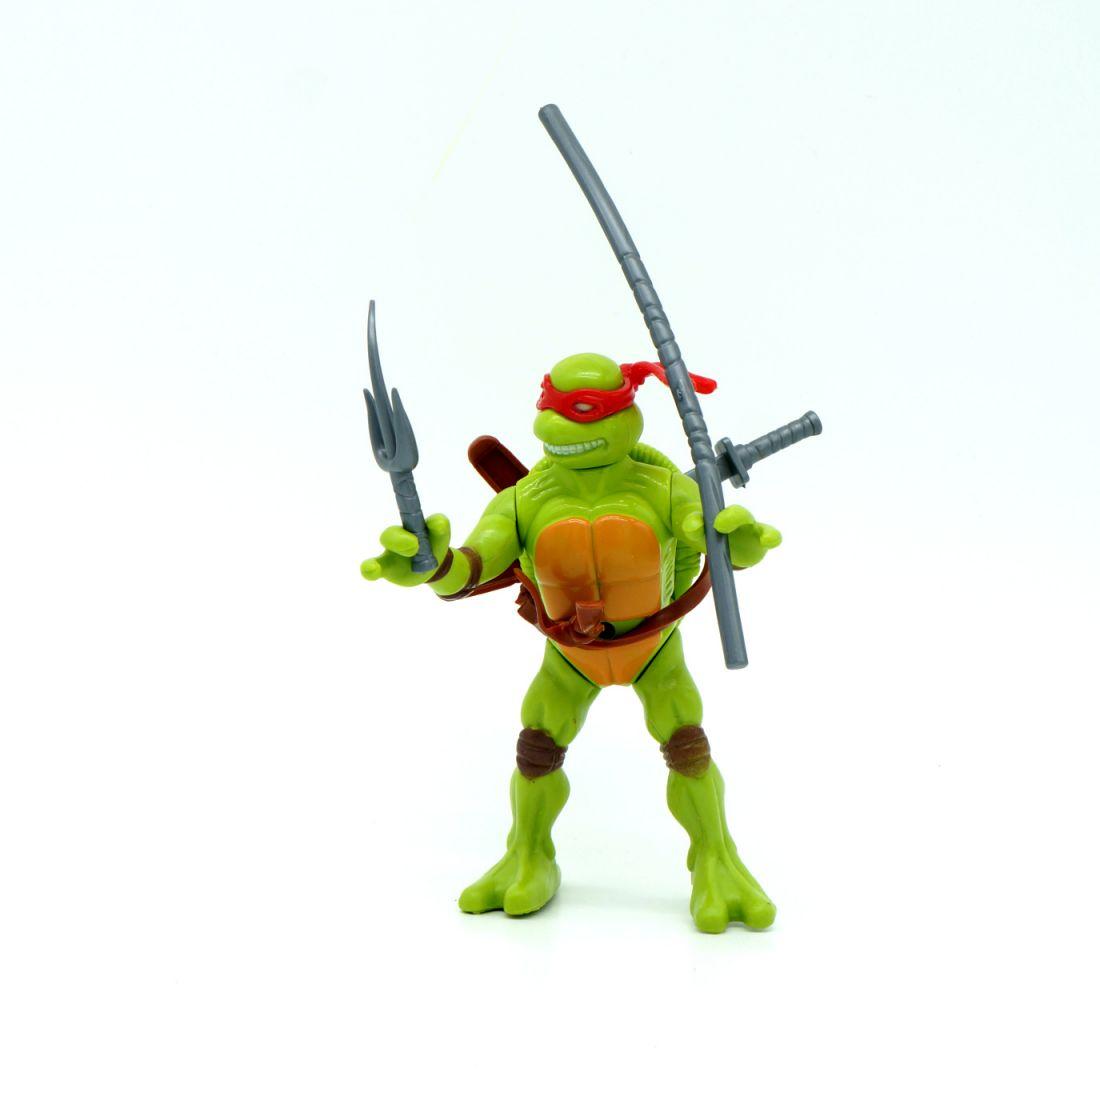 Фигурка Turtles черепашка ниндзя